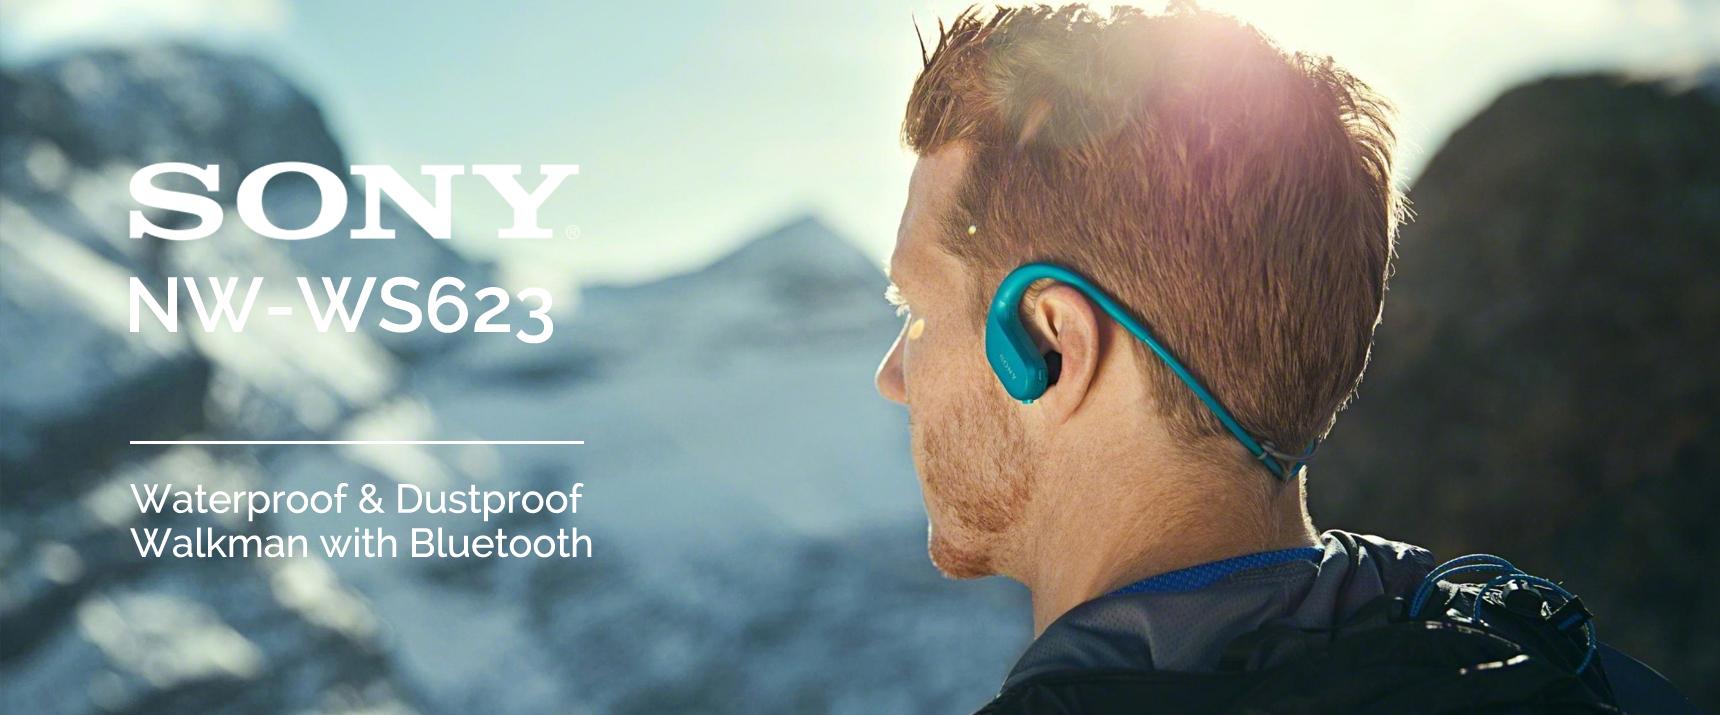 SONY WS623 – אוזניות בעלות נגן מובנה, מוגנות מים ואבק לחלוטין – עכשיו בגרסת הBluetooth!!